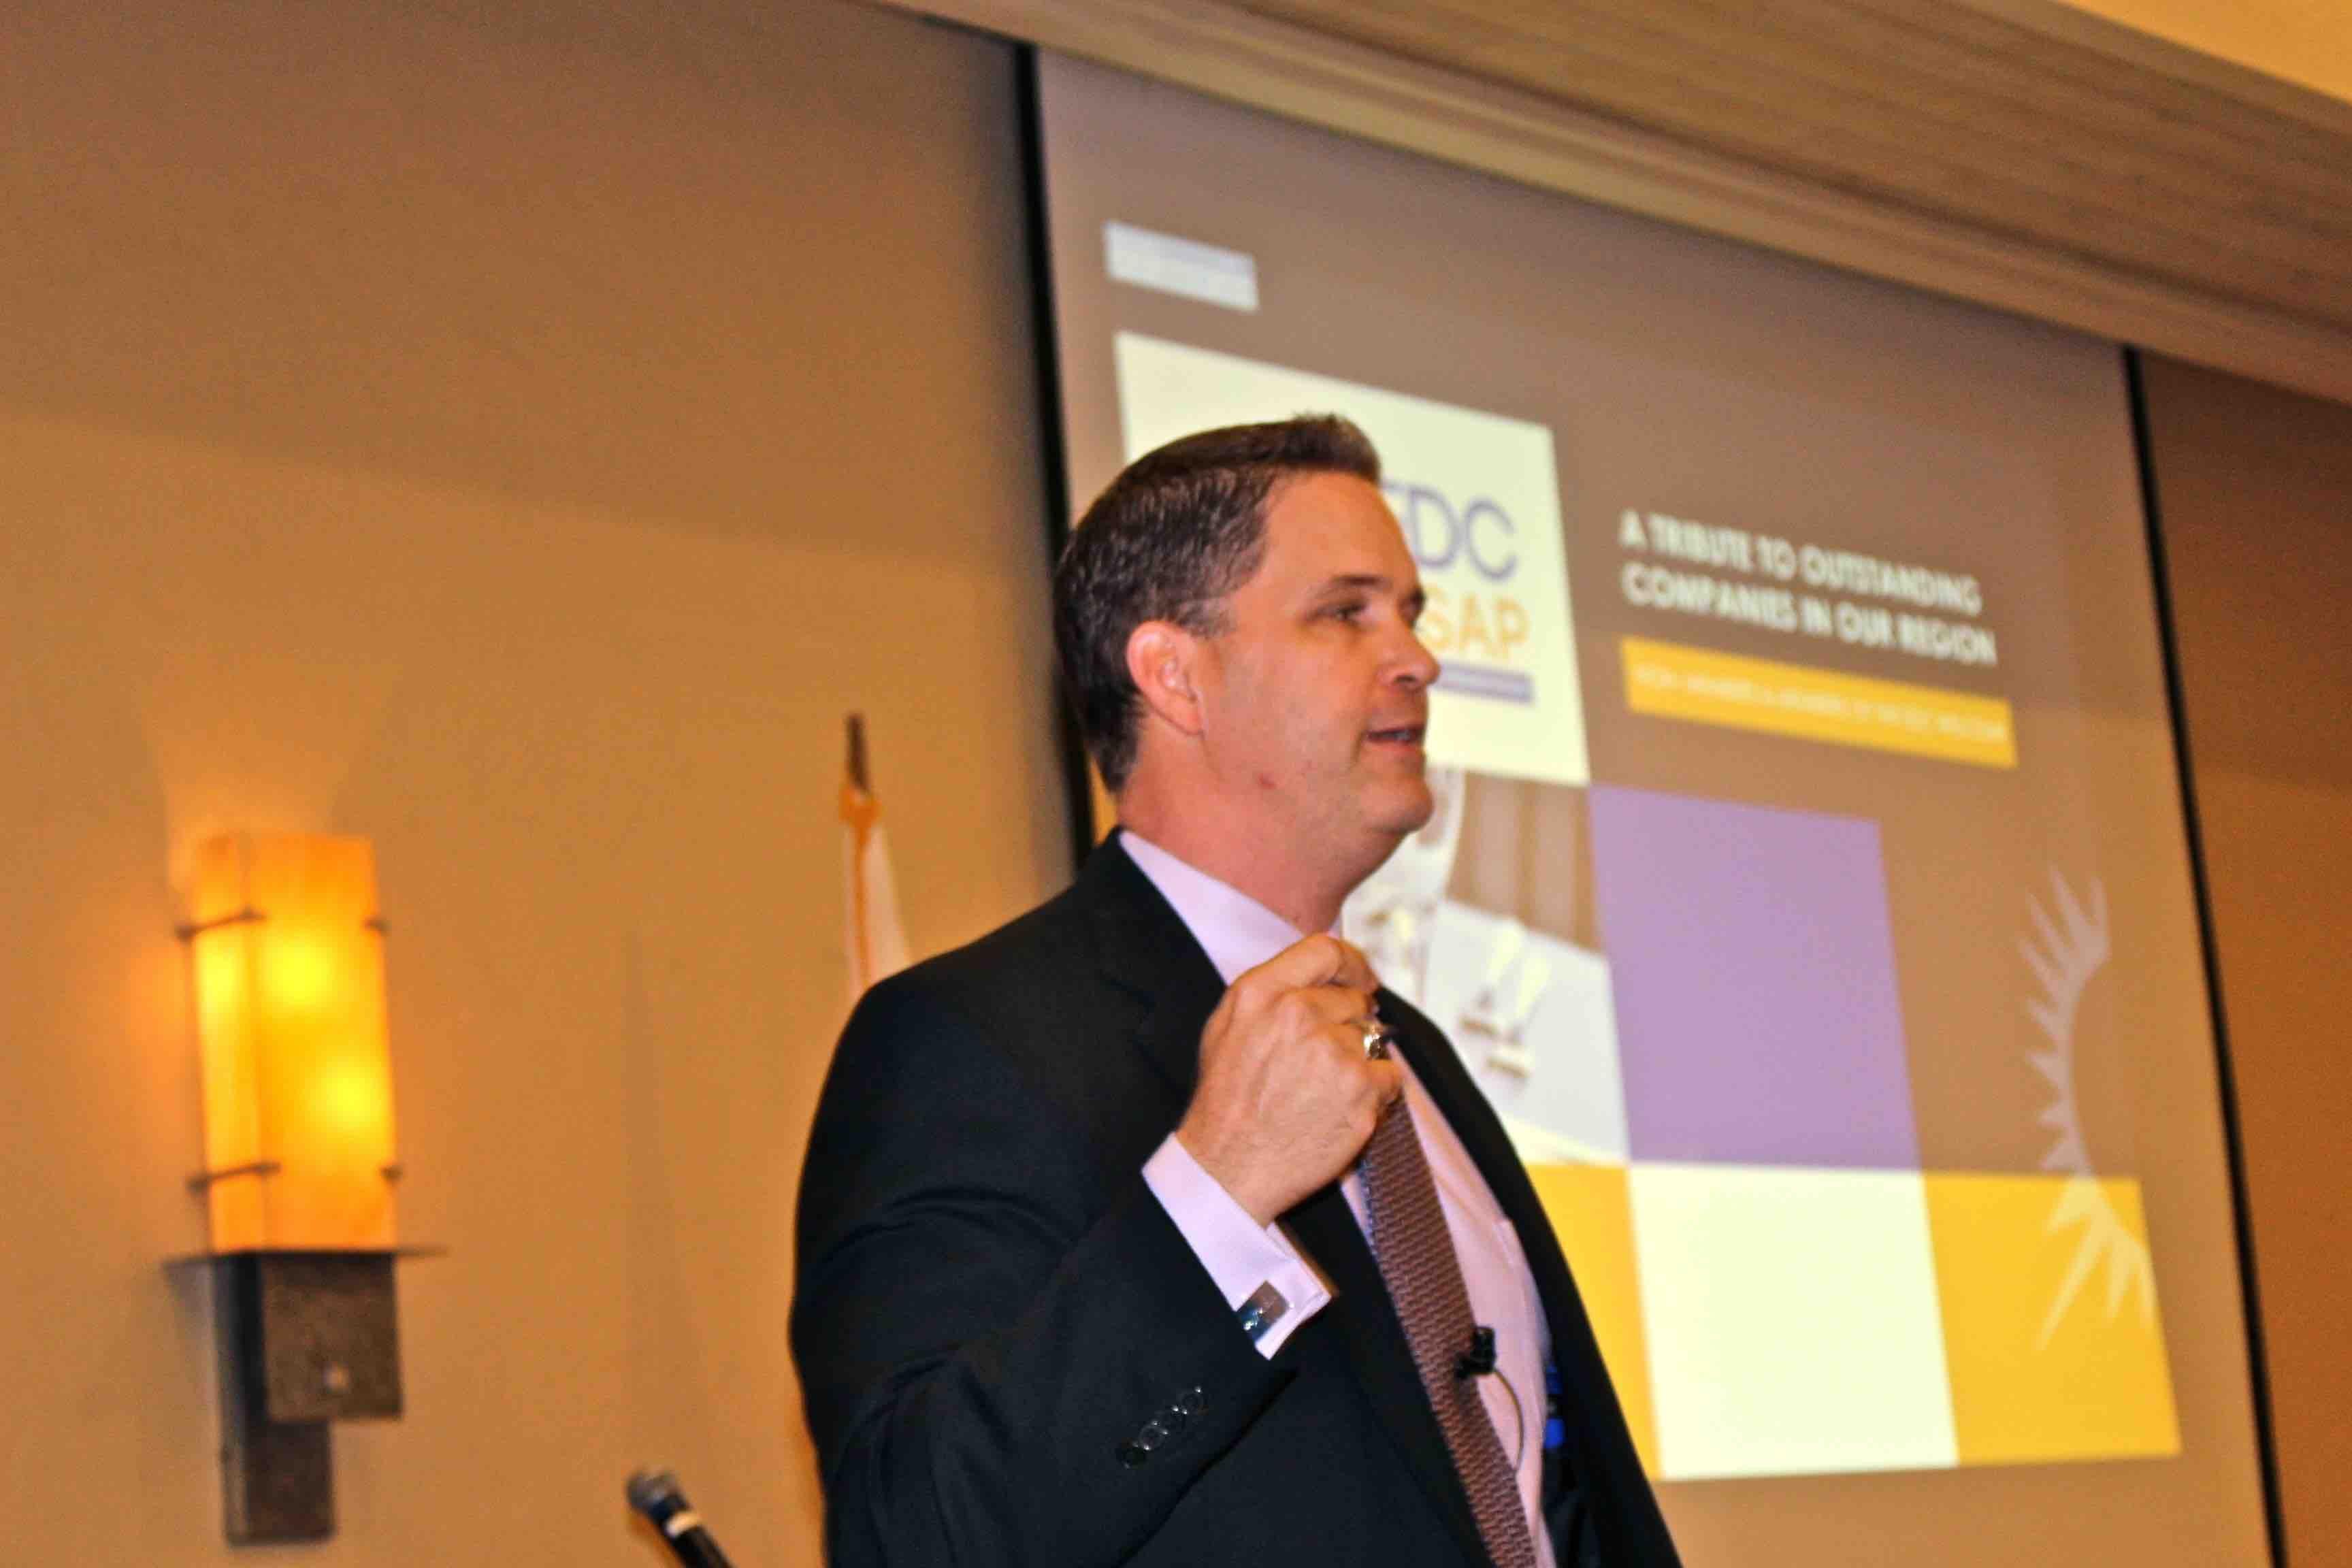 Keynote Speaker Wes Schaeffer at the EDC